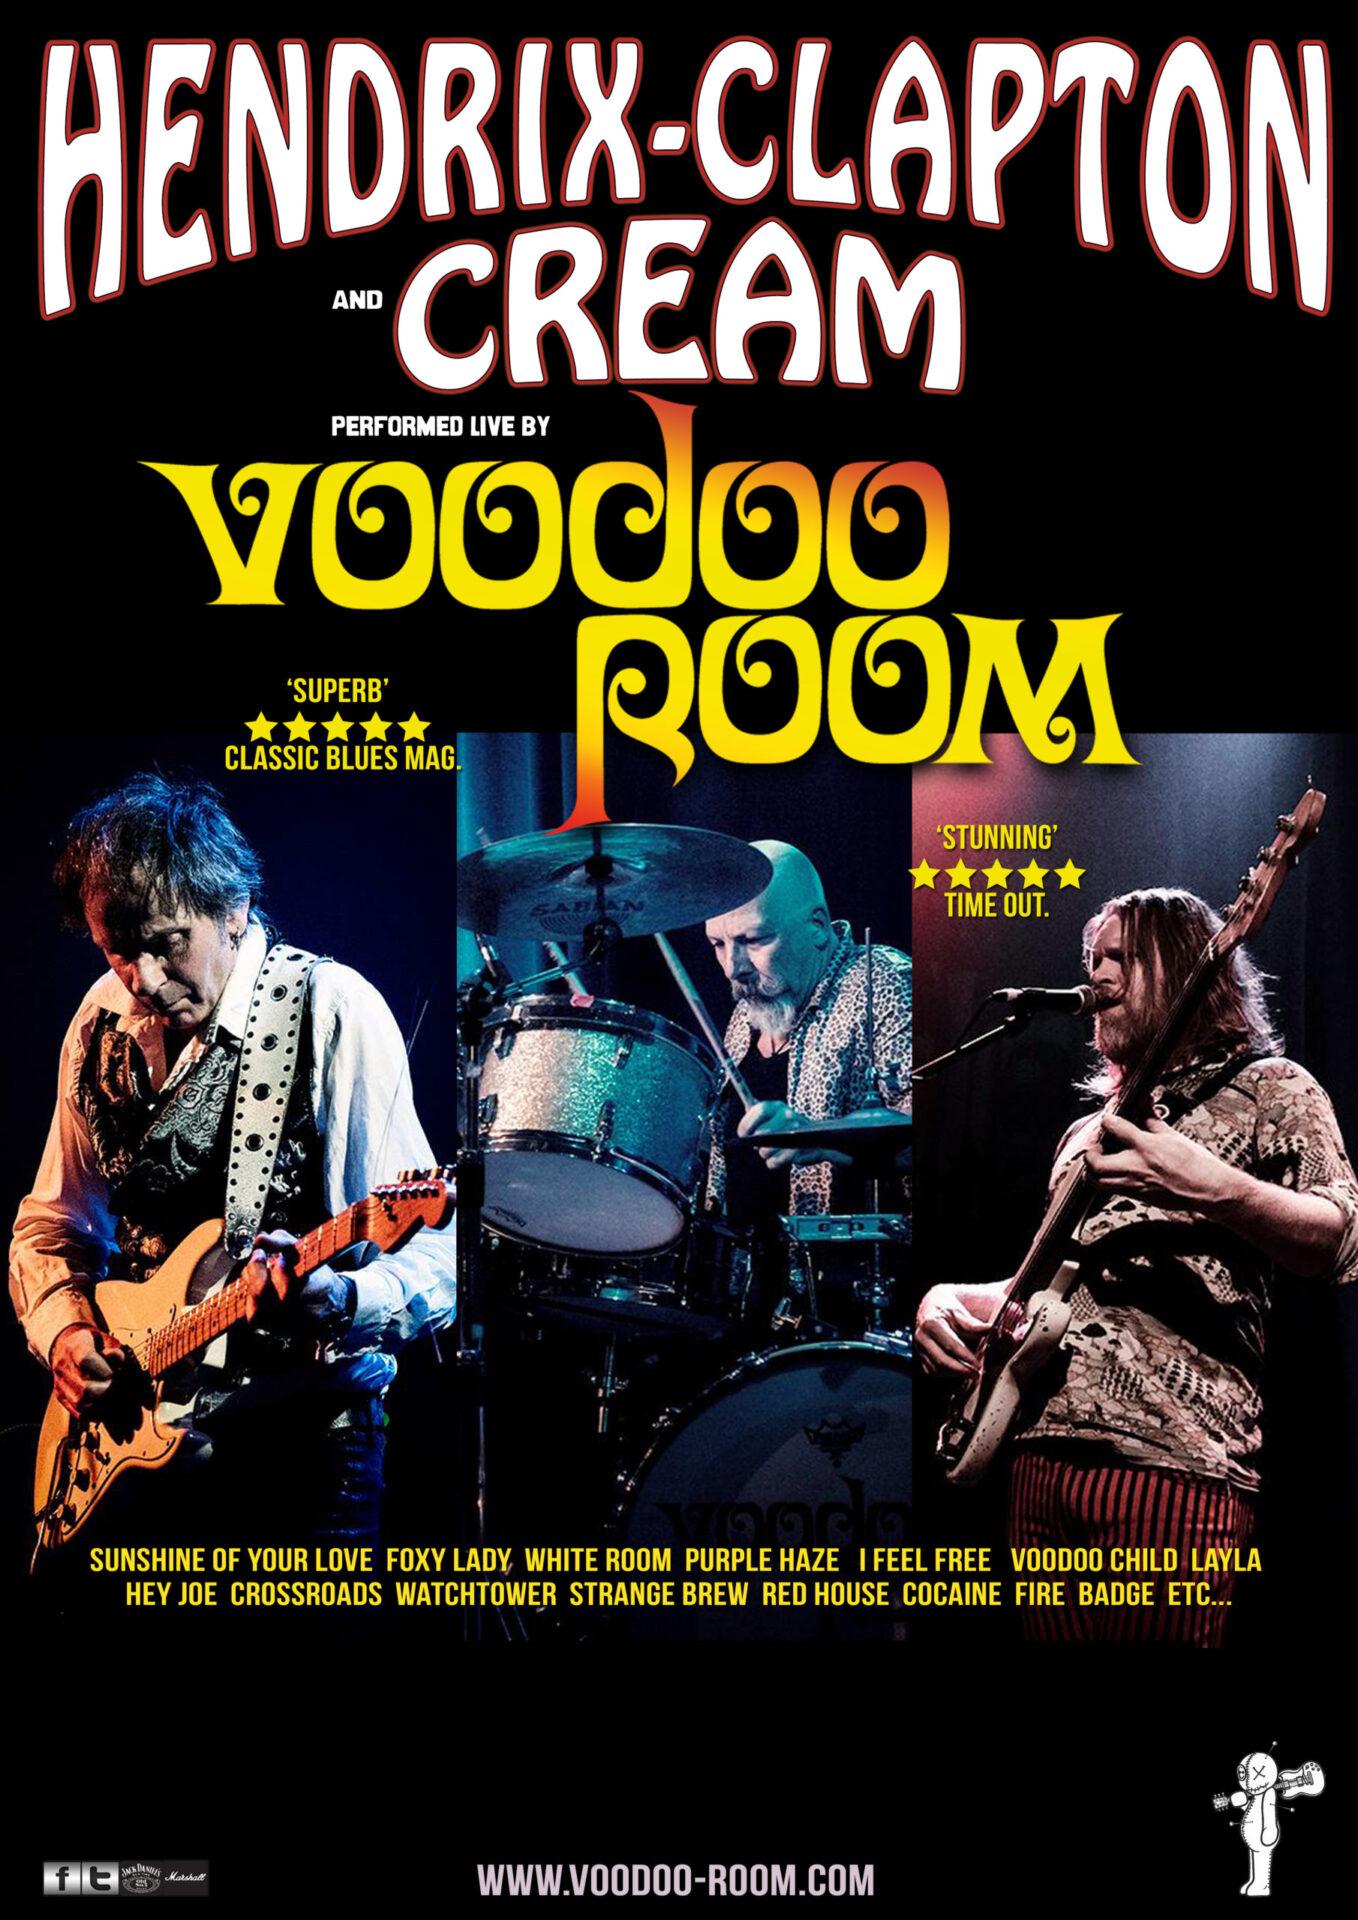 Voodoo Room – A Night of Hendrix, Clapton and Cream